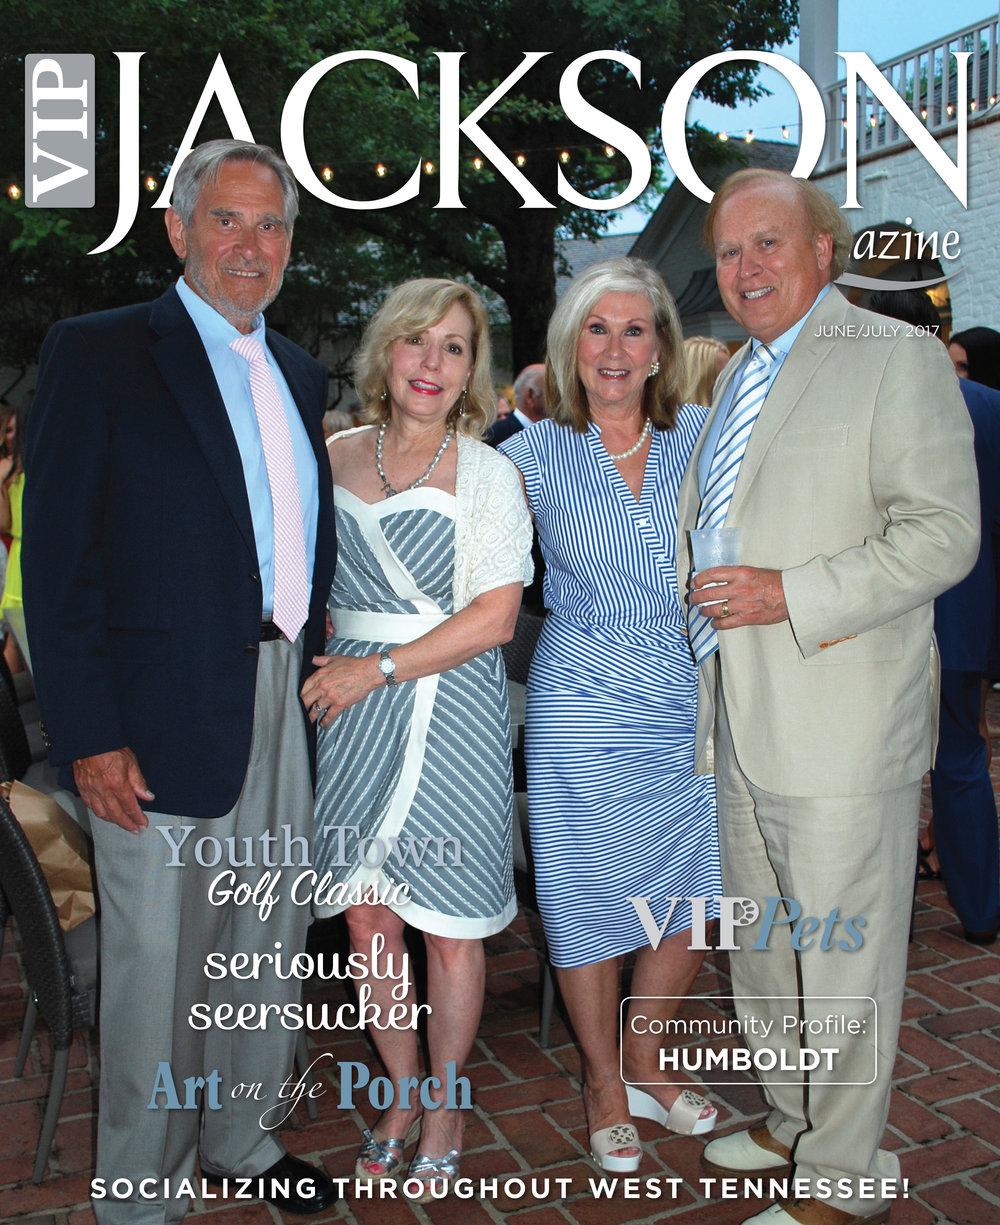 VIPJackson Jun17 pg001.jpg